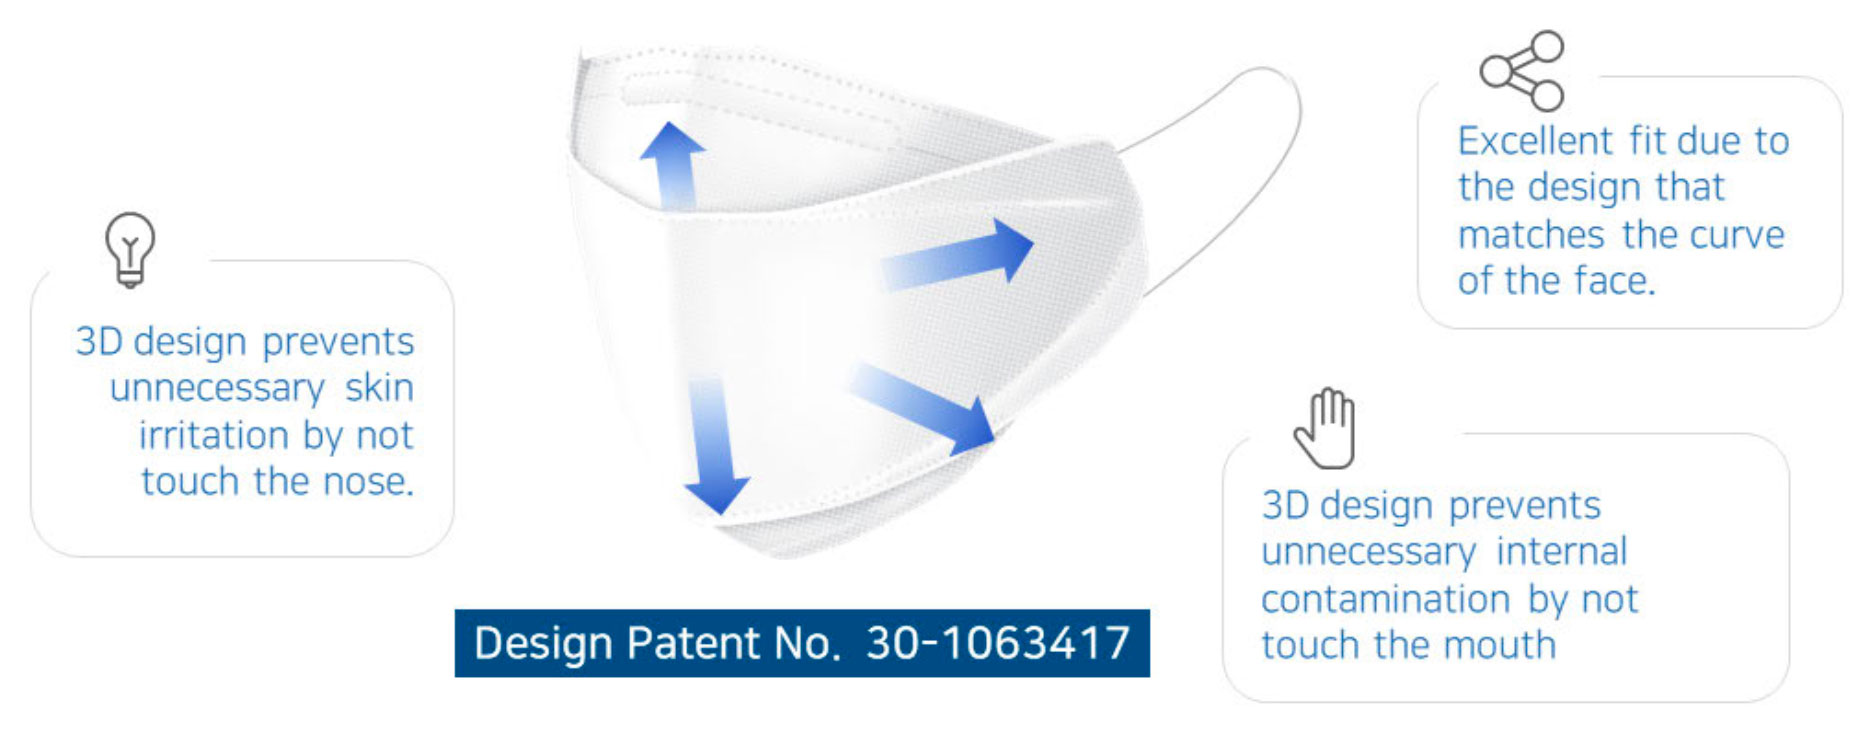 skycare-patent